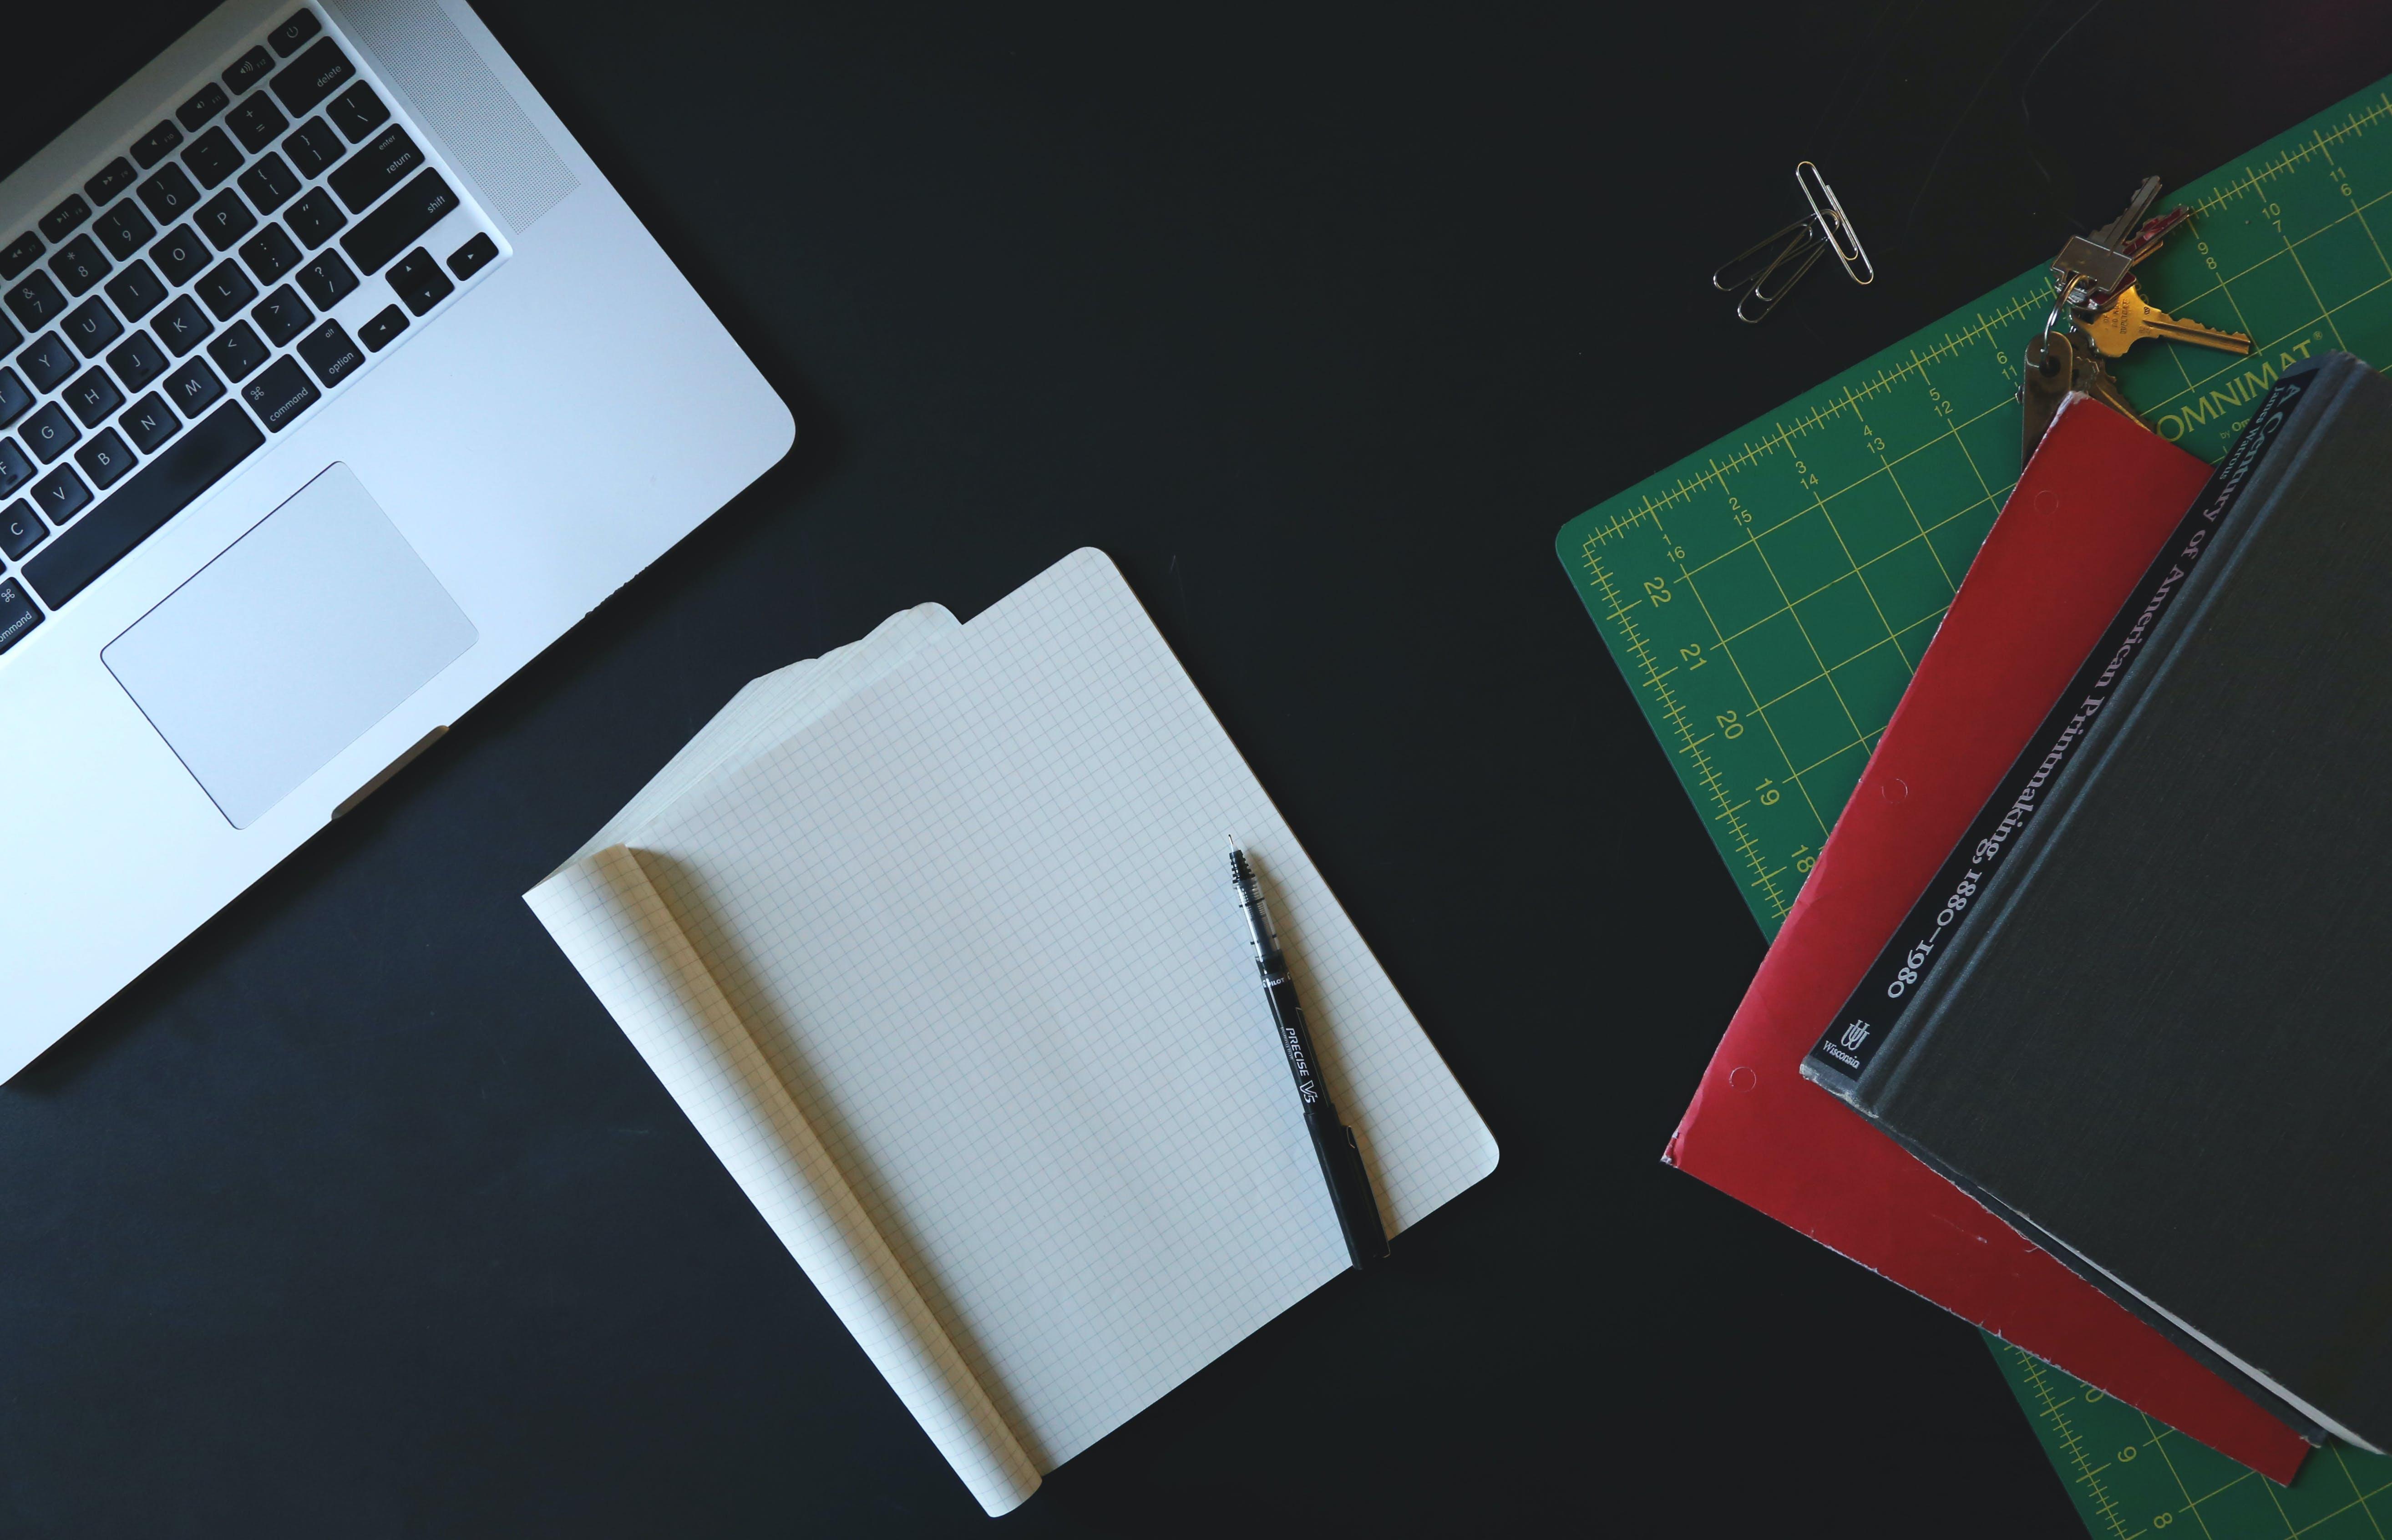 White Printer Paper Beside Macbook Pro on Black Surface